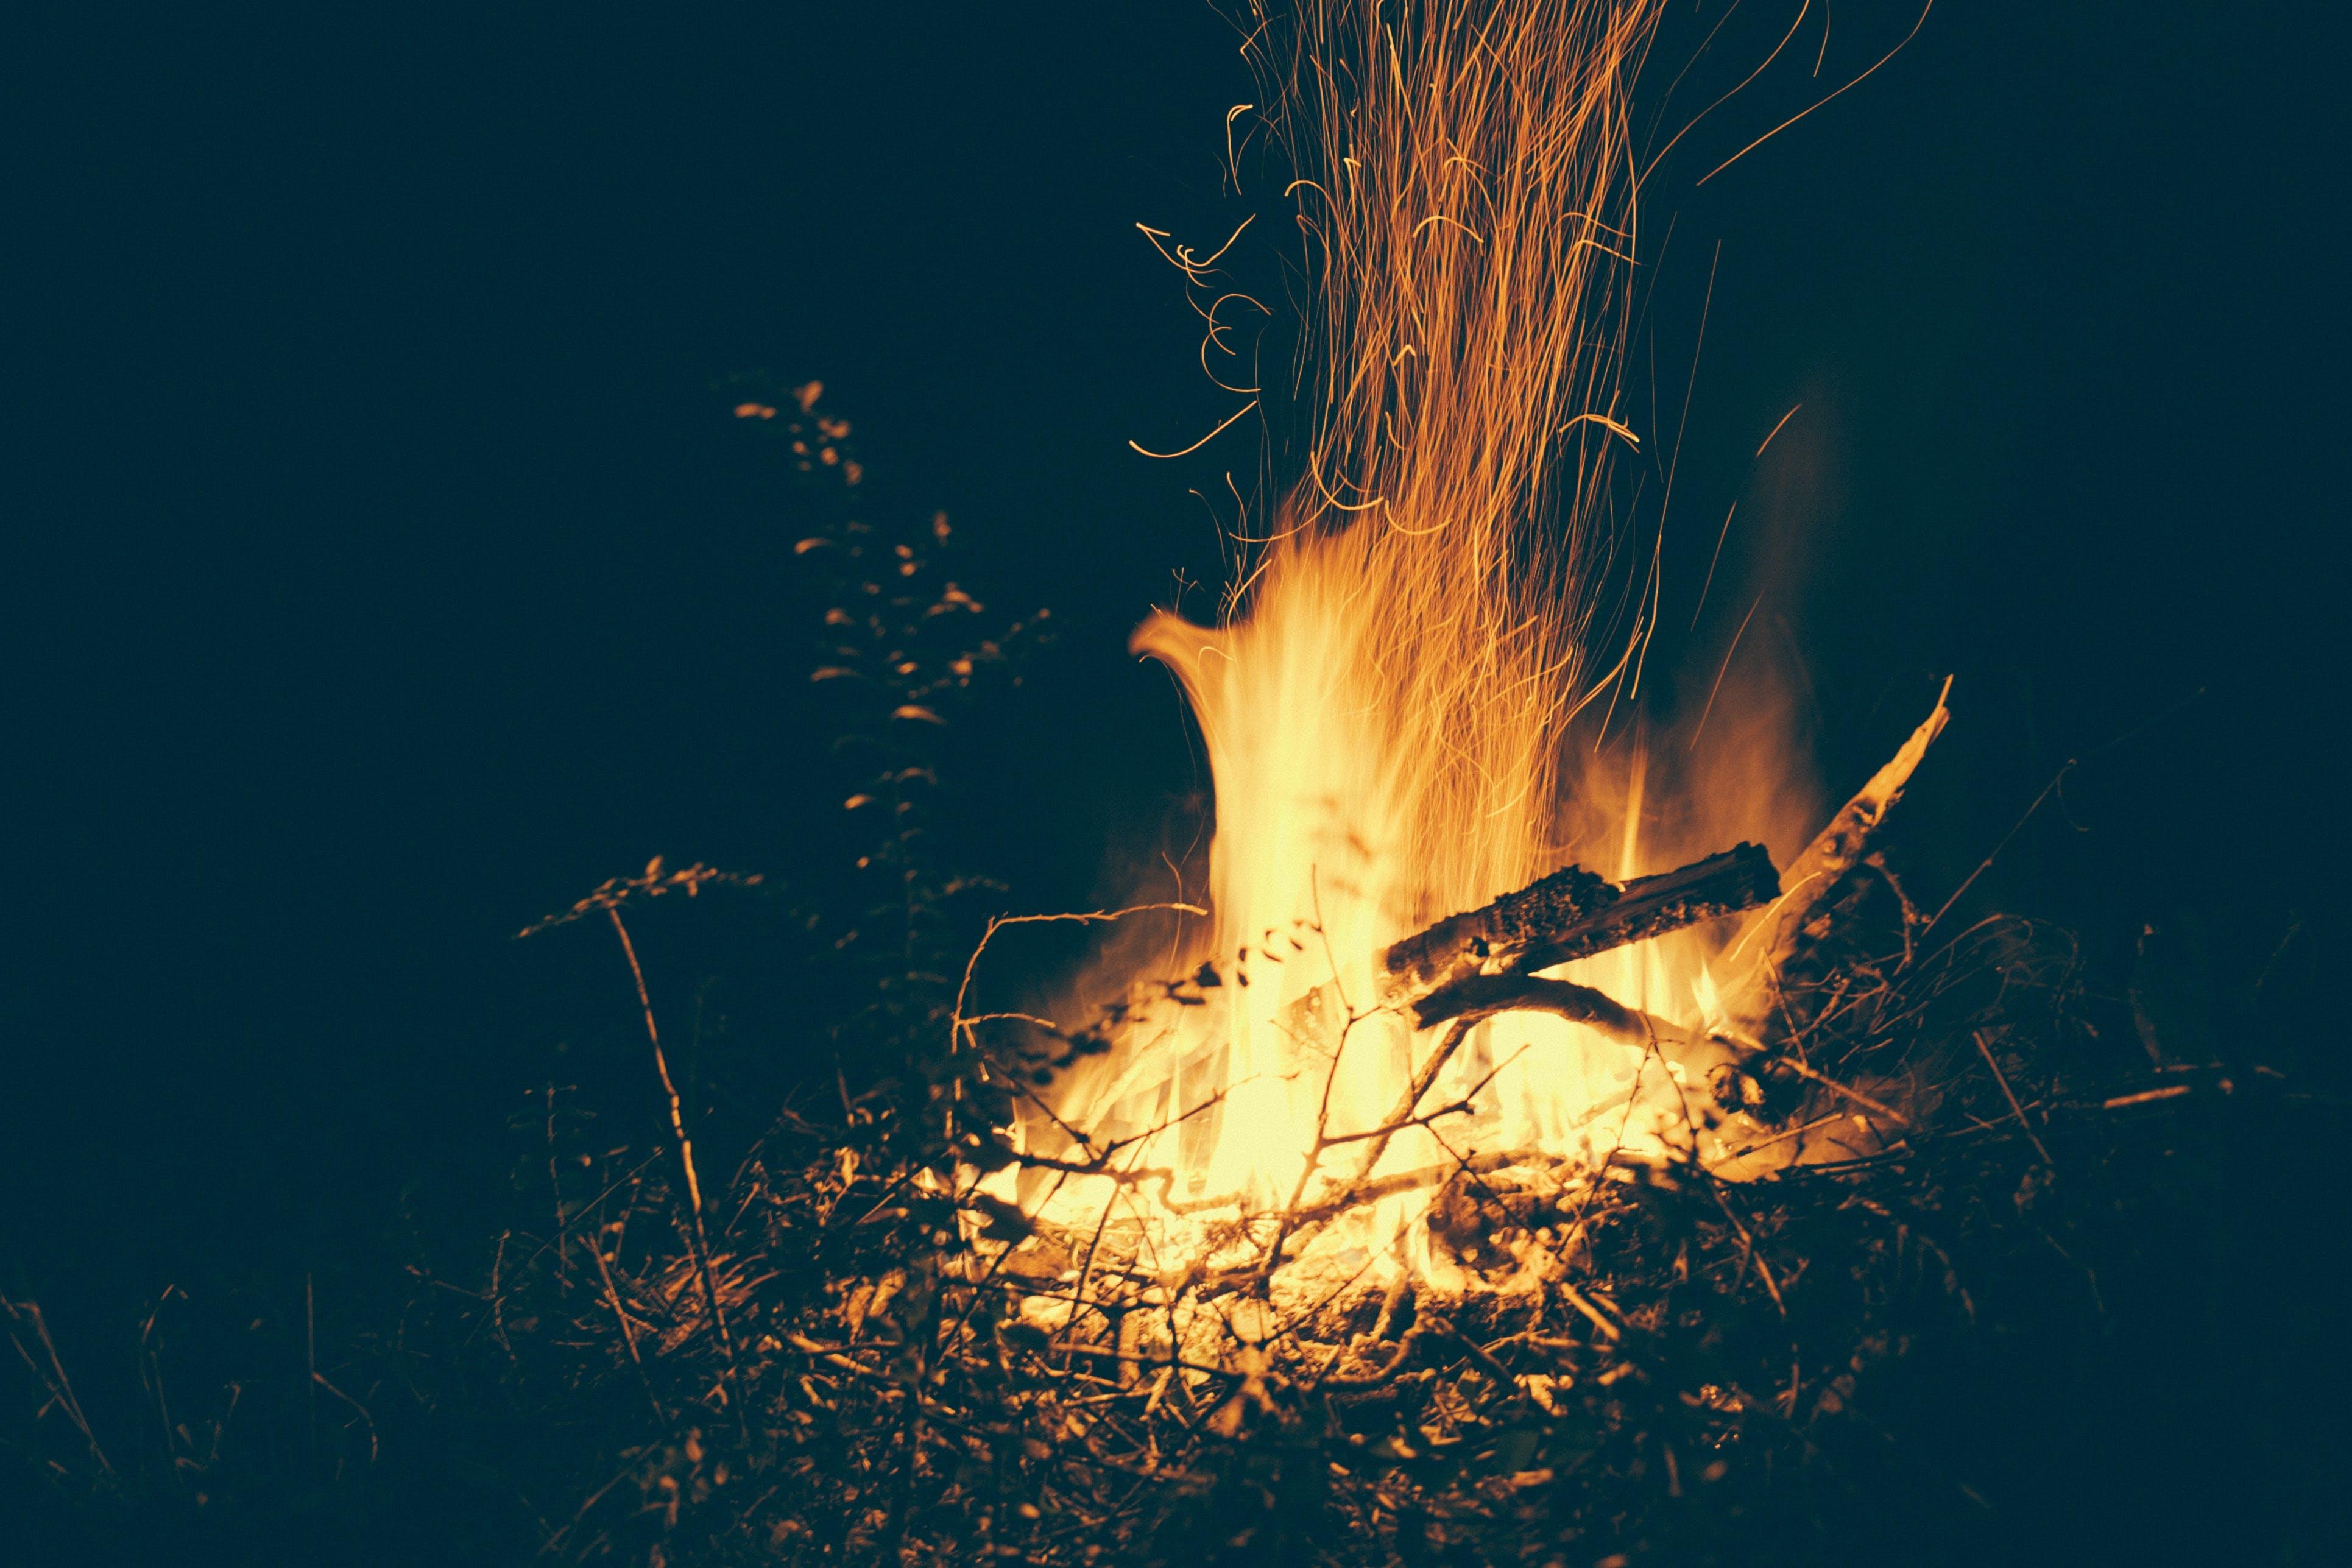 blaze, bonfire, burn